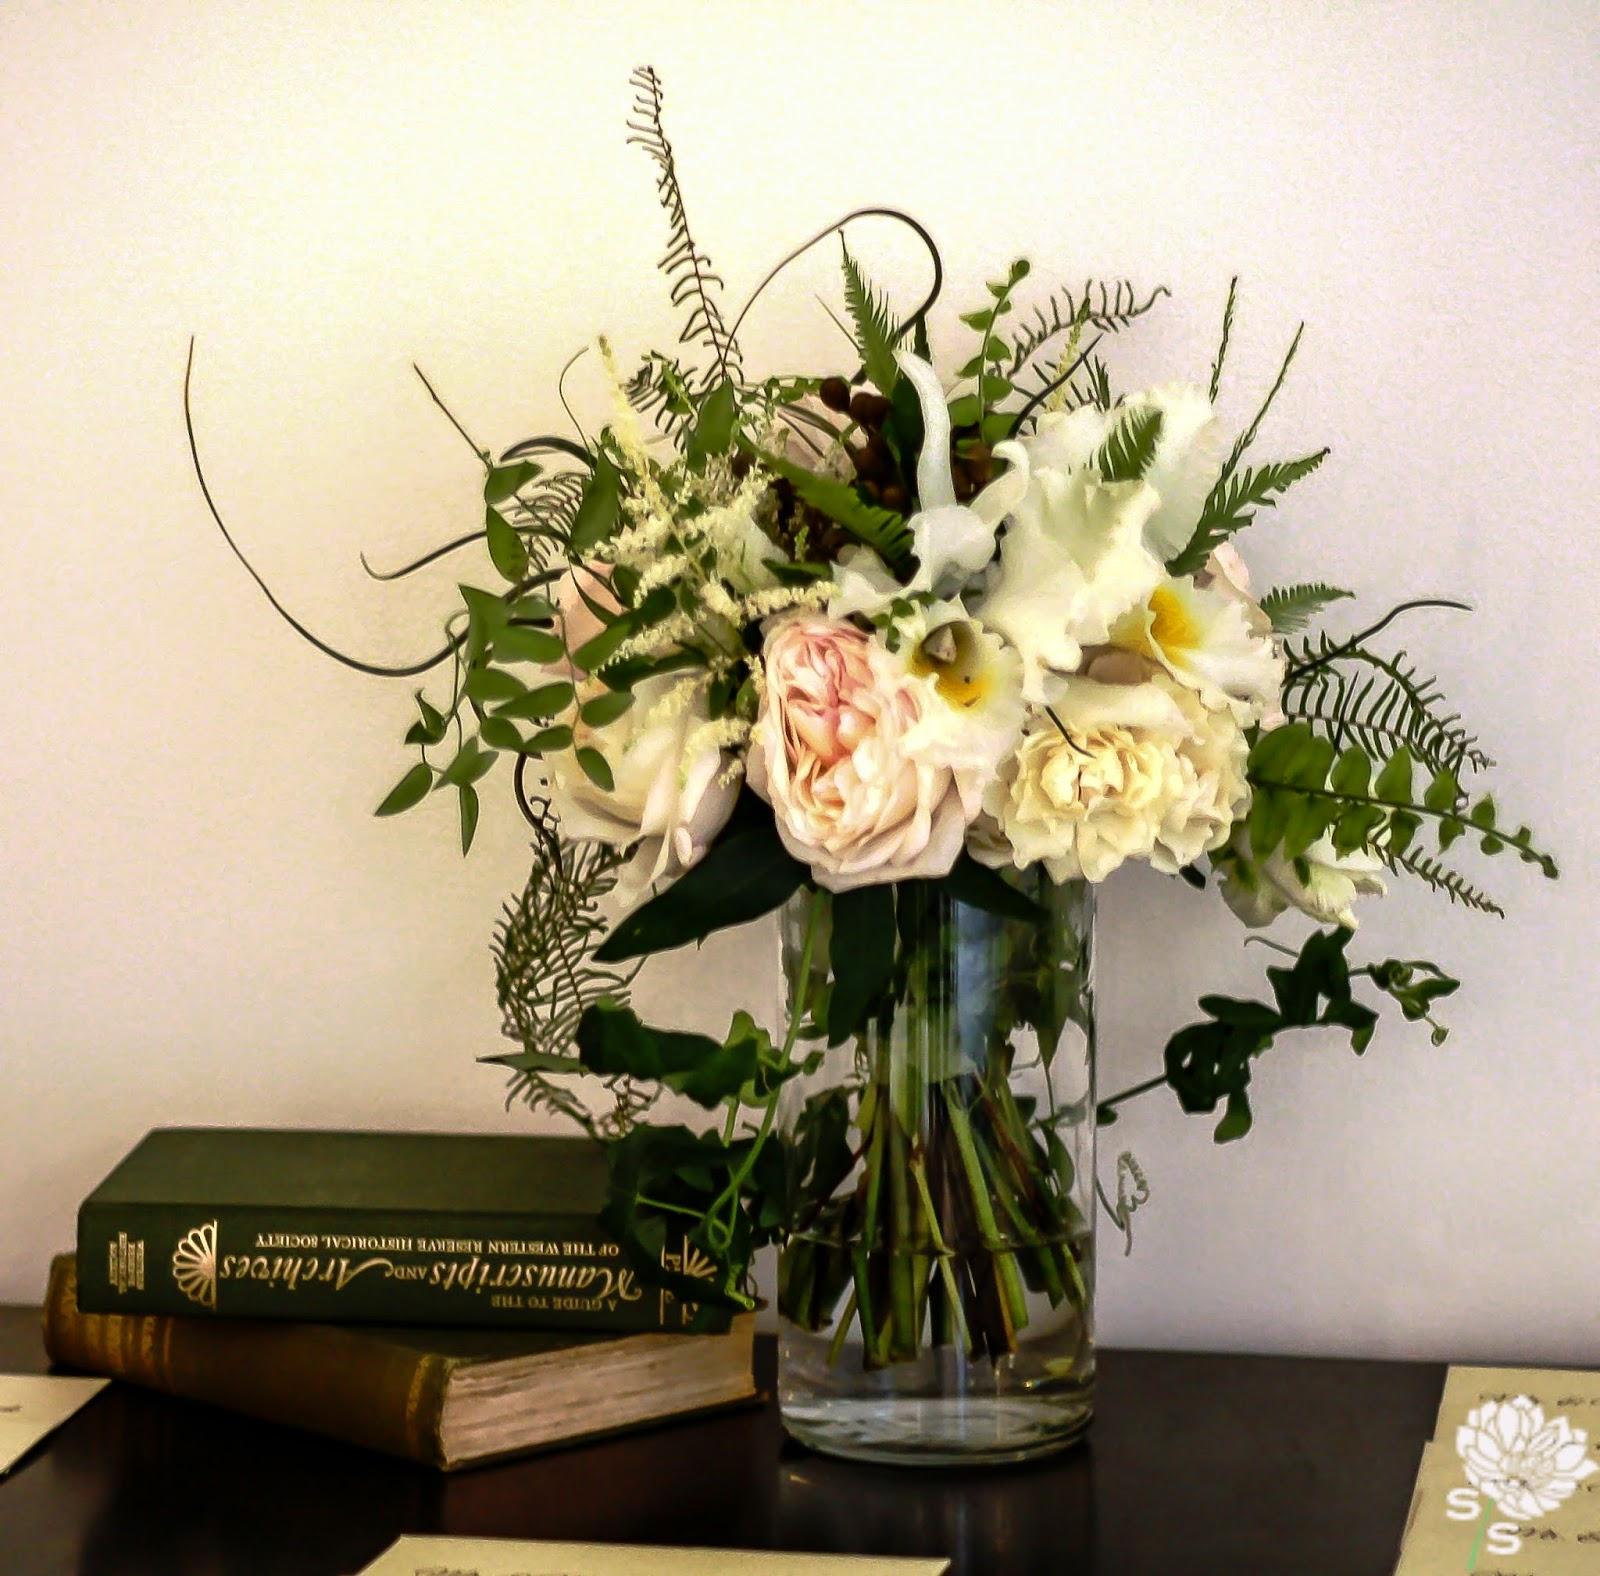 The Roundhouse Wedding - Beacon, NY - Hudson Valley Wedding - Wedding Flowers - Splendid Stems Floral Designs